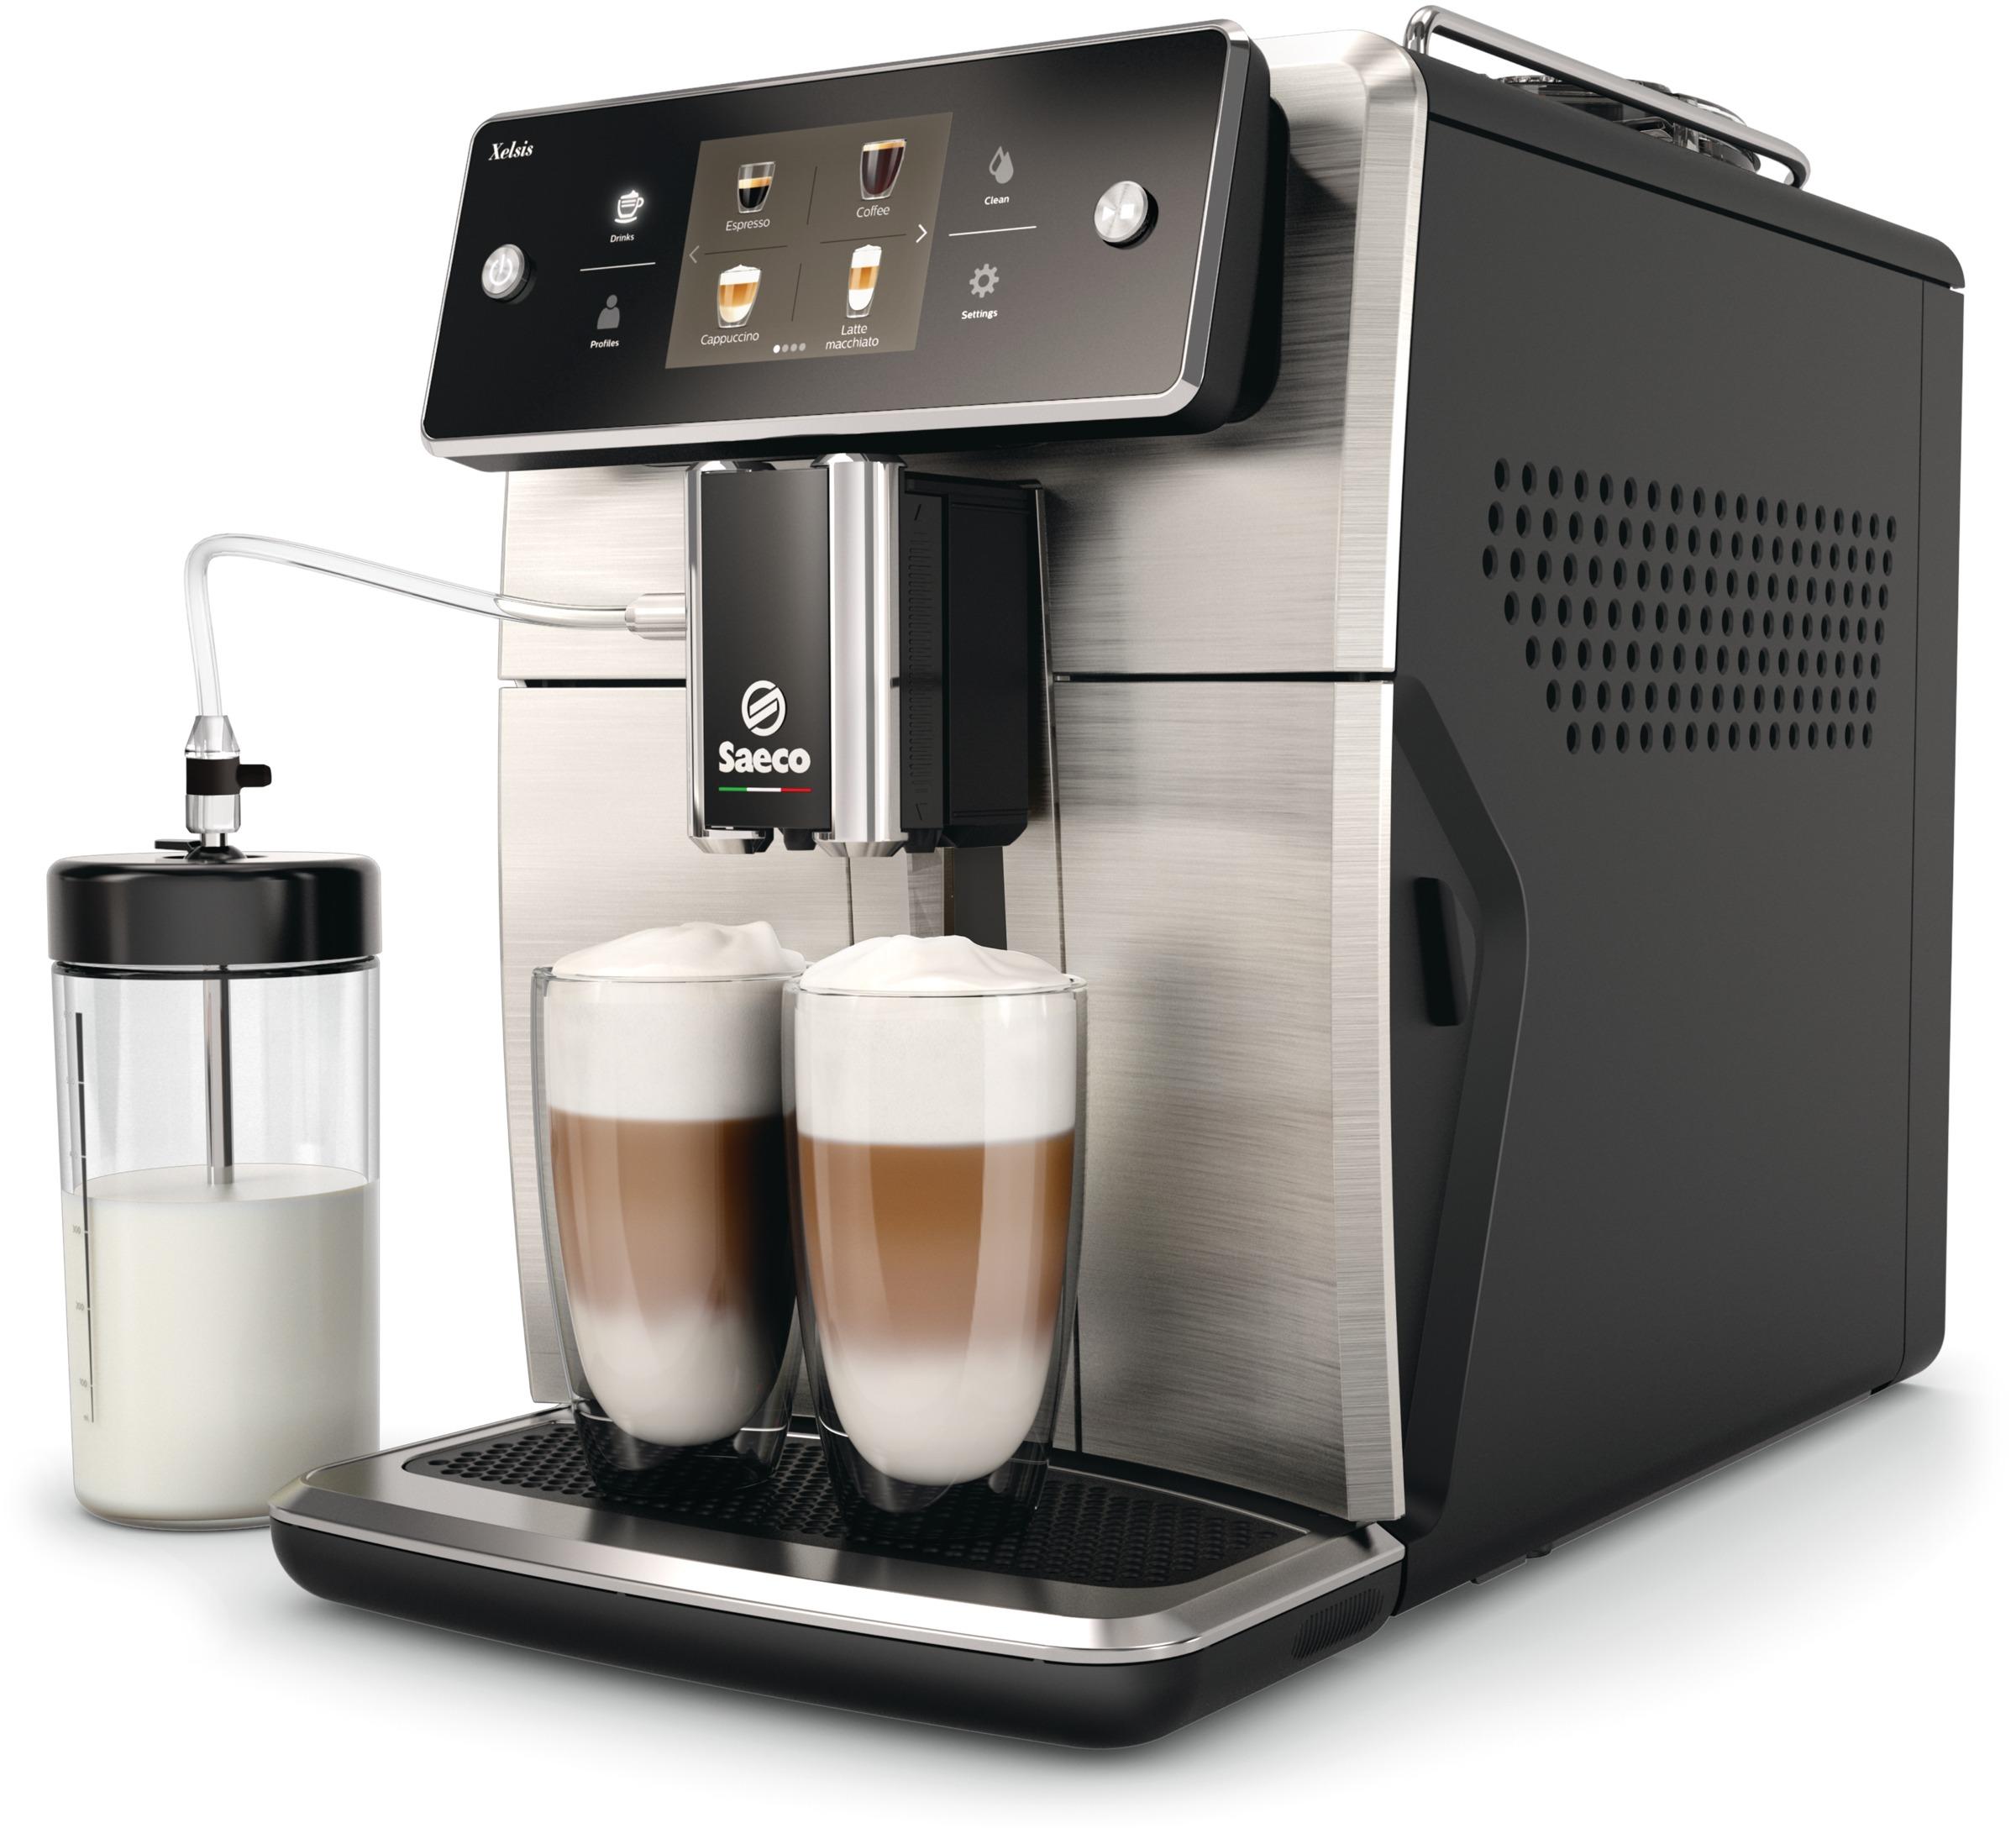 Saeco Xelsis SM7683/00 кофемашина elikor аметист s4 60п 700 э4г